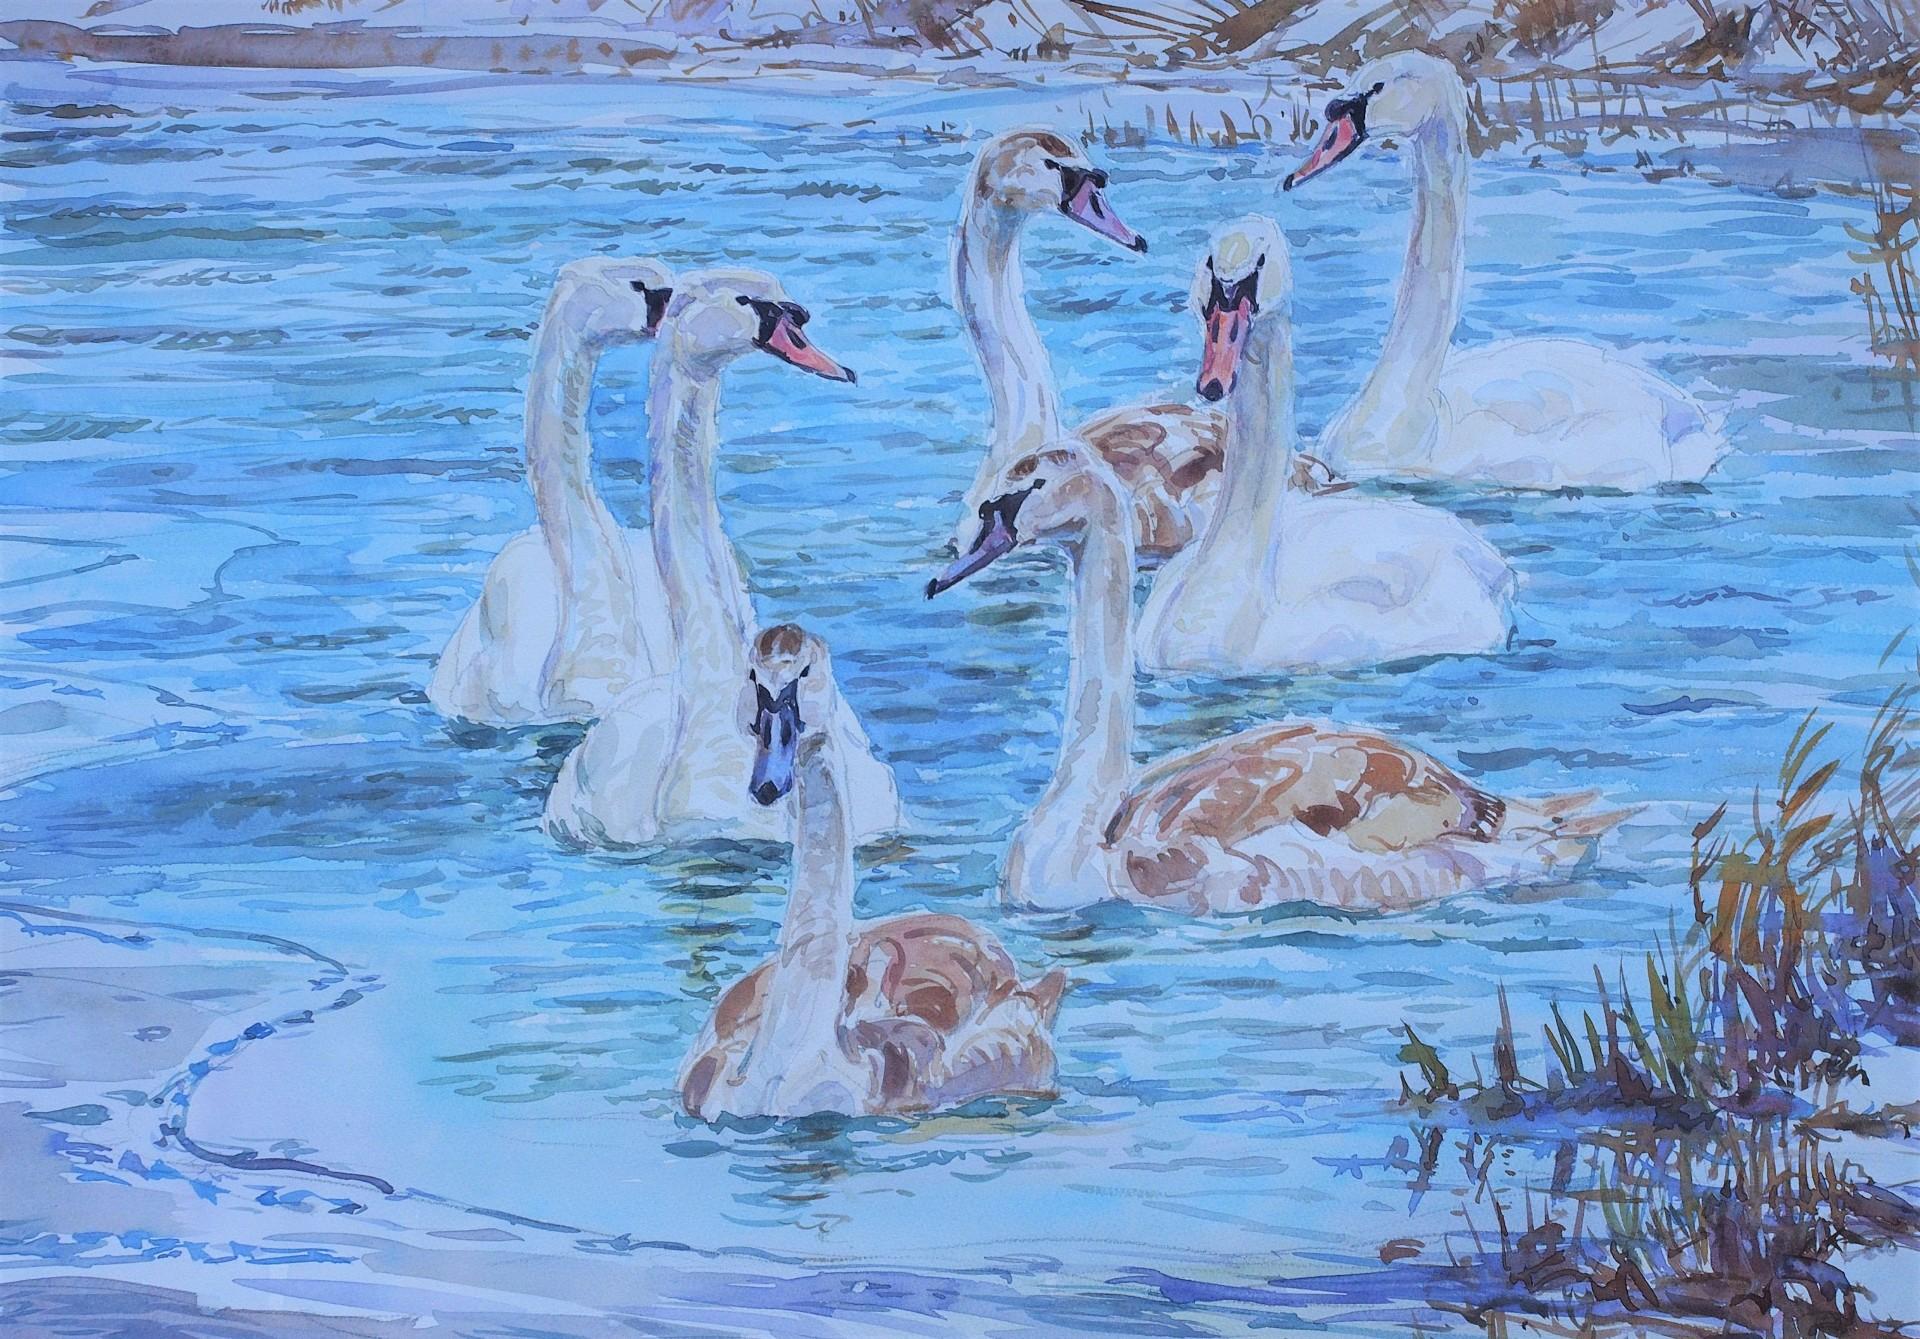 Mute Swans on Frozen Canal, Hagg Bridge